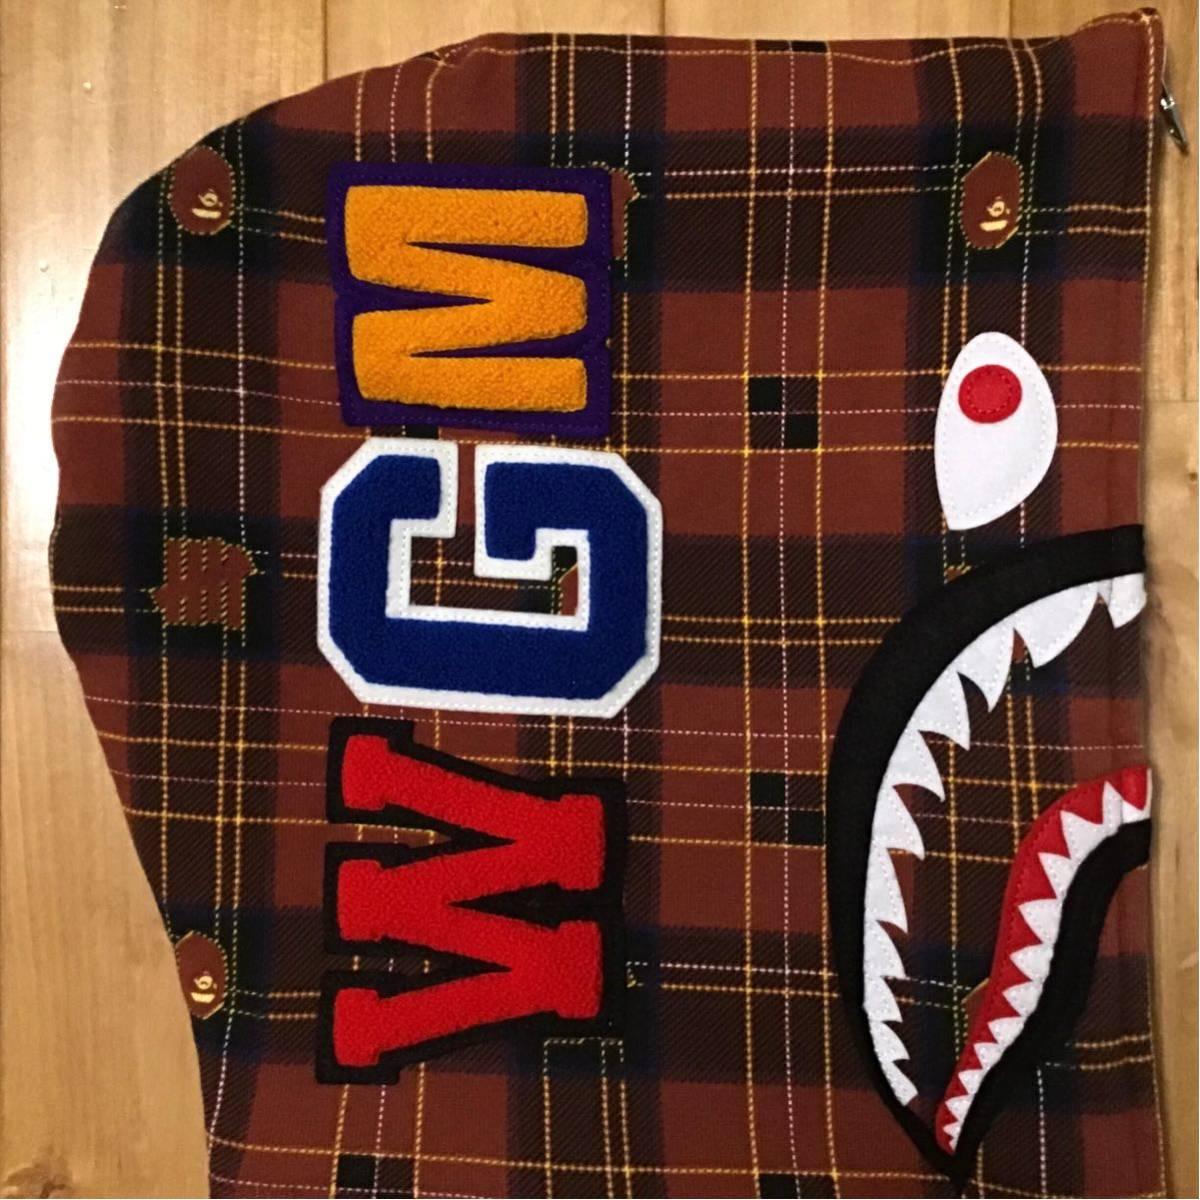 undefeated × BAPE シャーク パーカー Sサイズ check shark full zip hoodie a bathing ape エイプ ベイプ アンディフィーテッド 08la